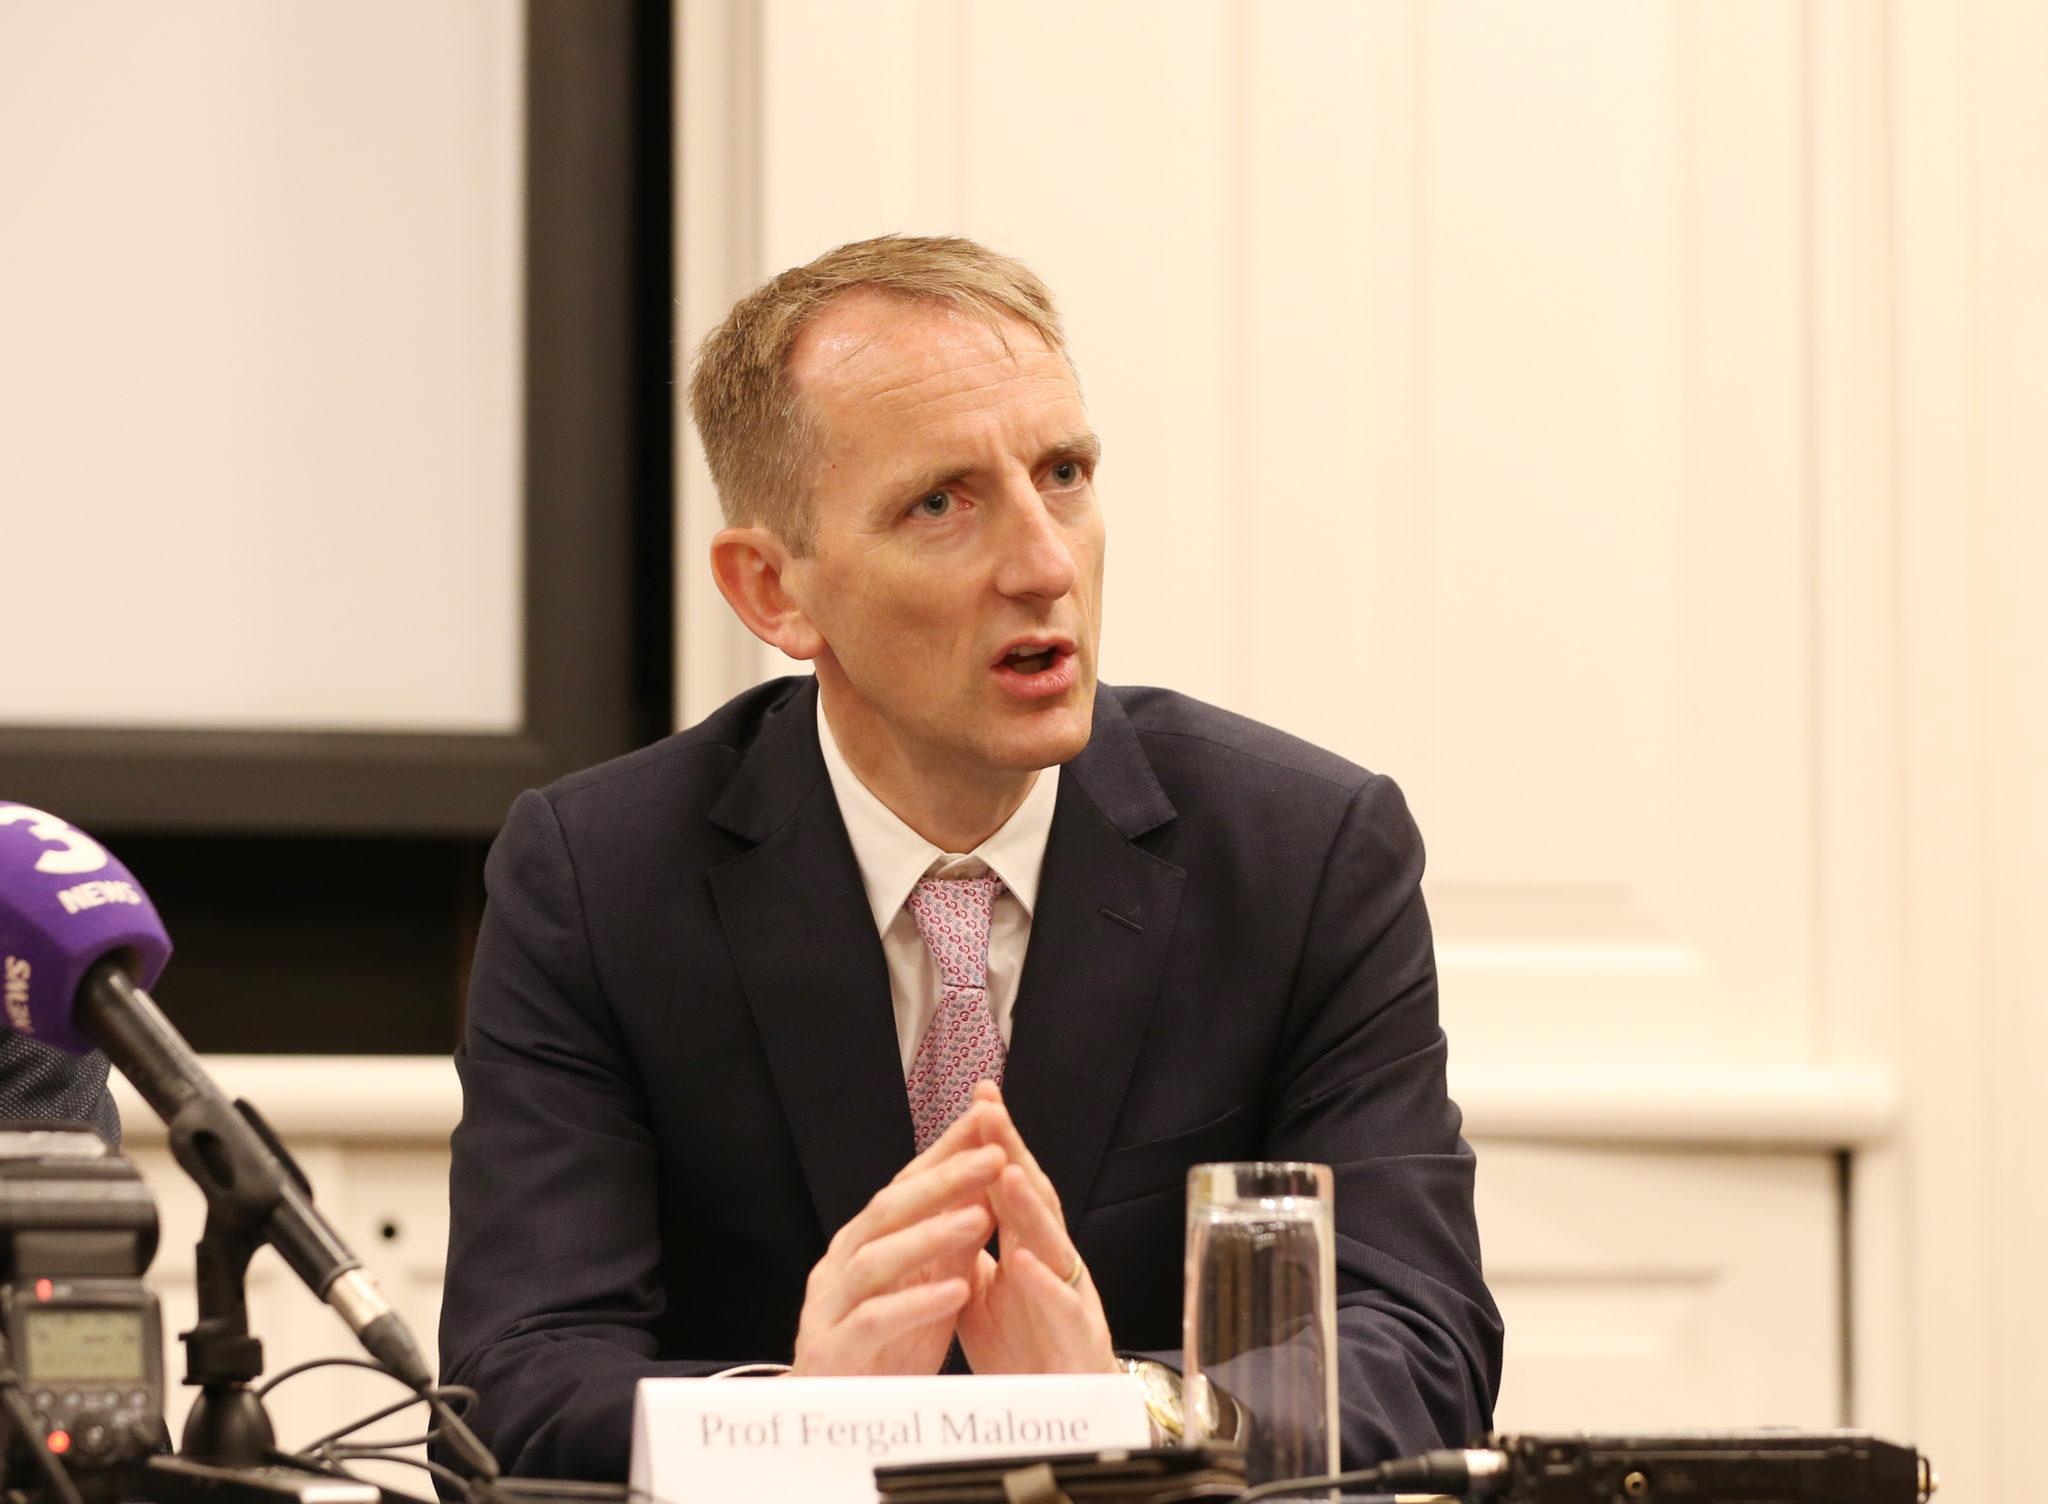 Master of the Rotunda Hospital, Prof Fergal Malone, addresses the media at a Dublin press conference in 2018.